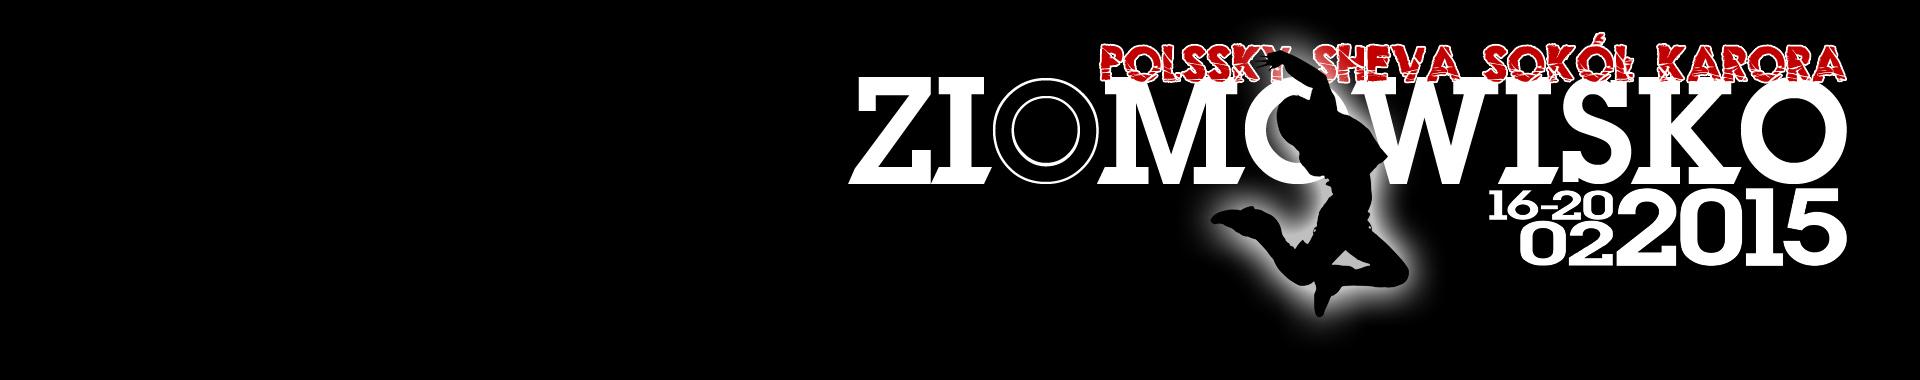 ZIOMOWISKO 2015